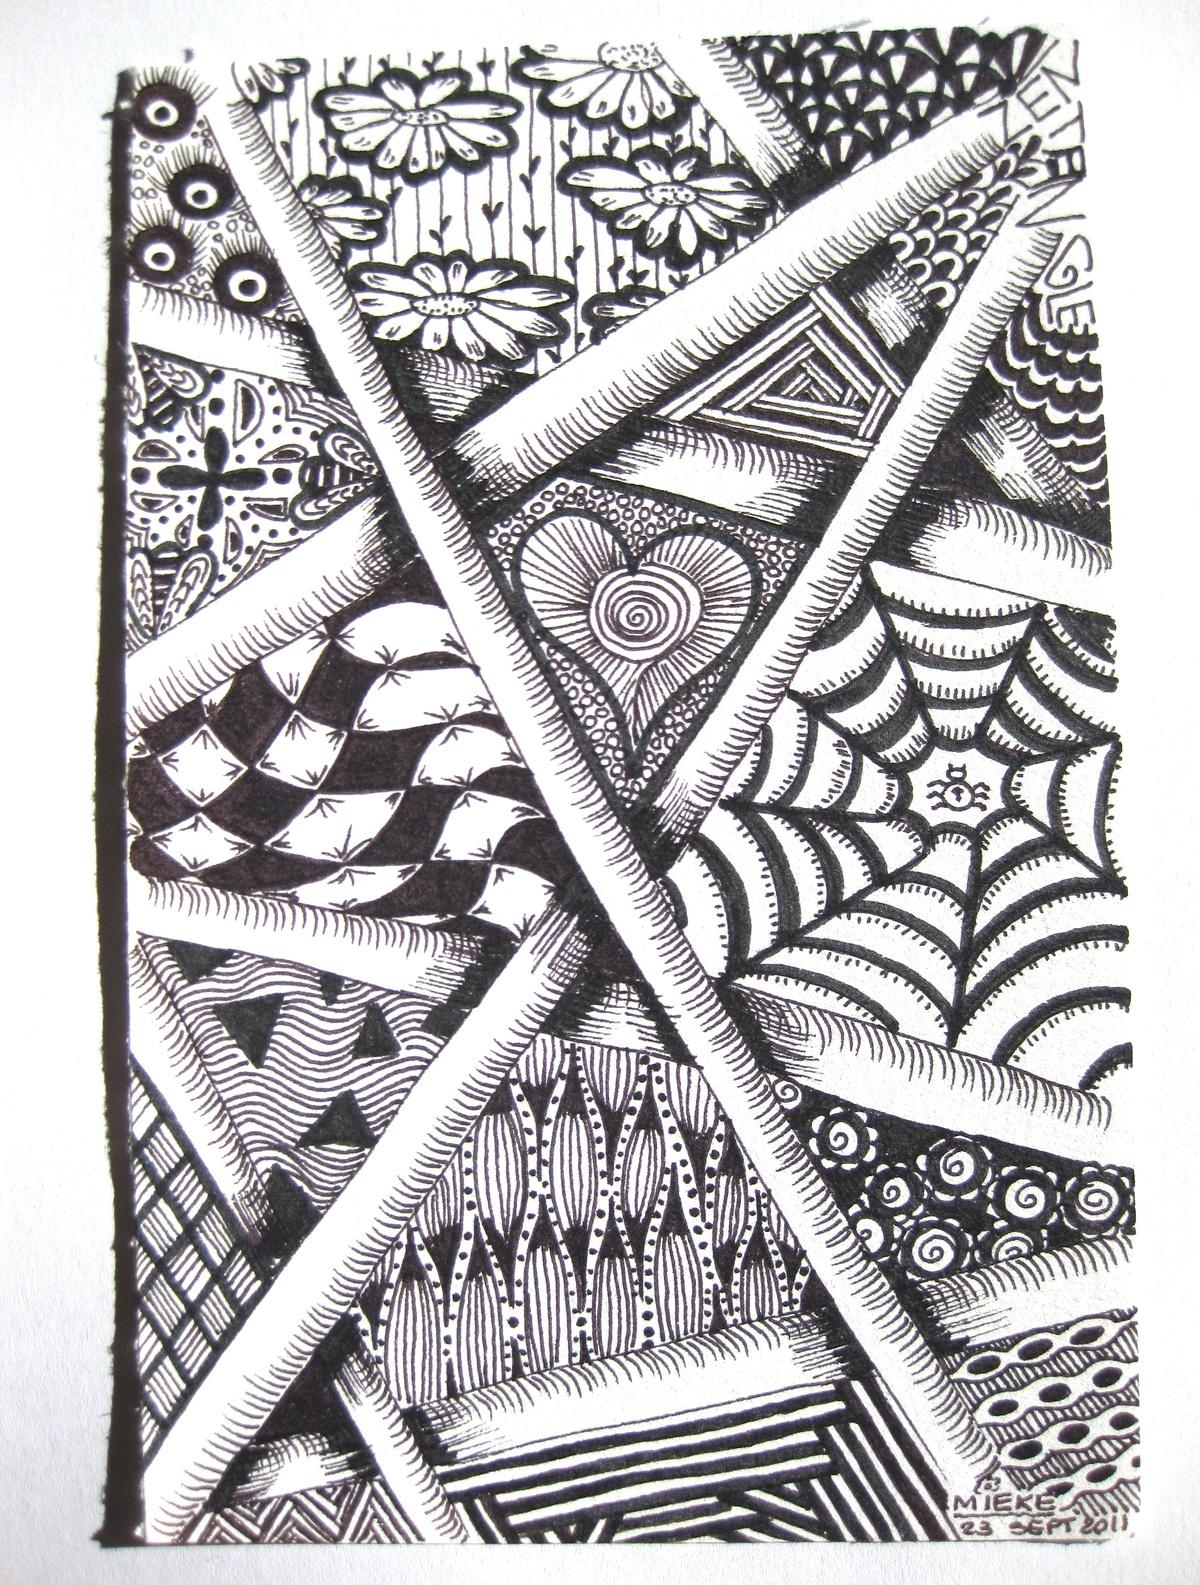 zentangle | Zentangle artwork, Tangle art, Pen pattern